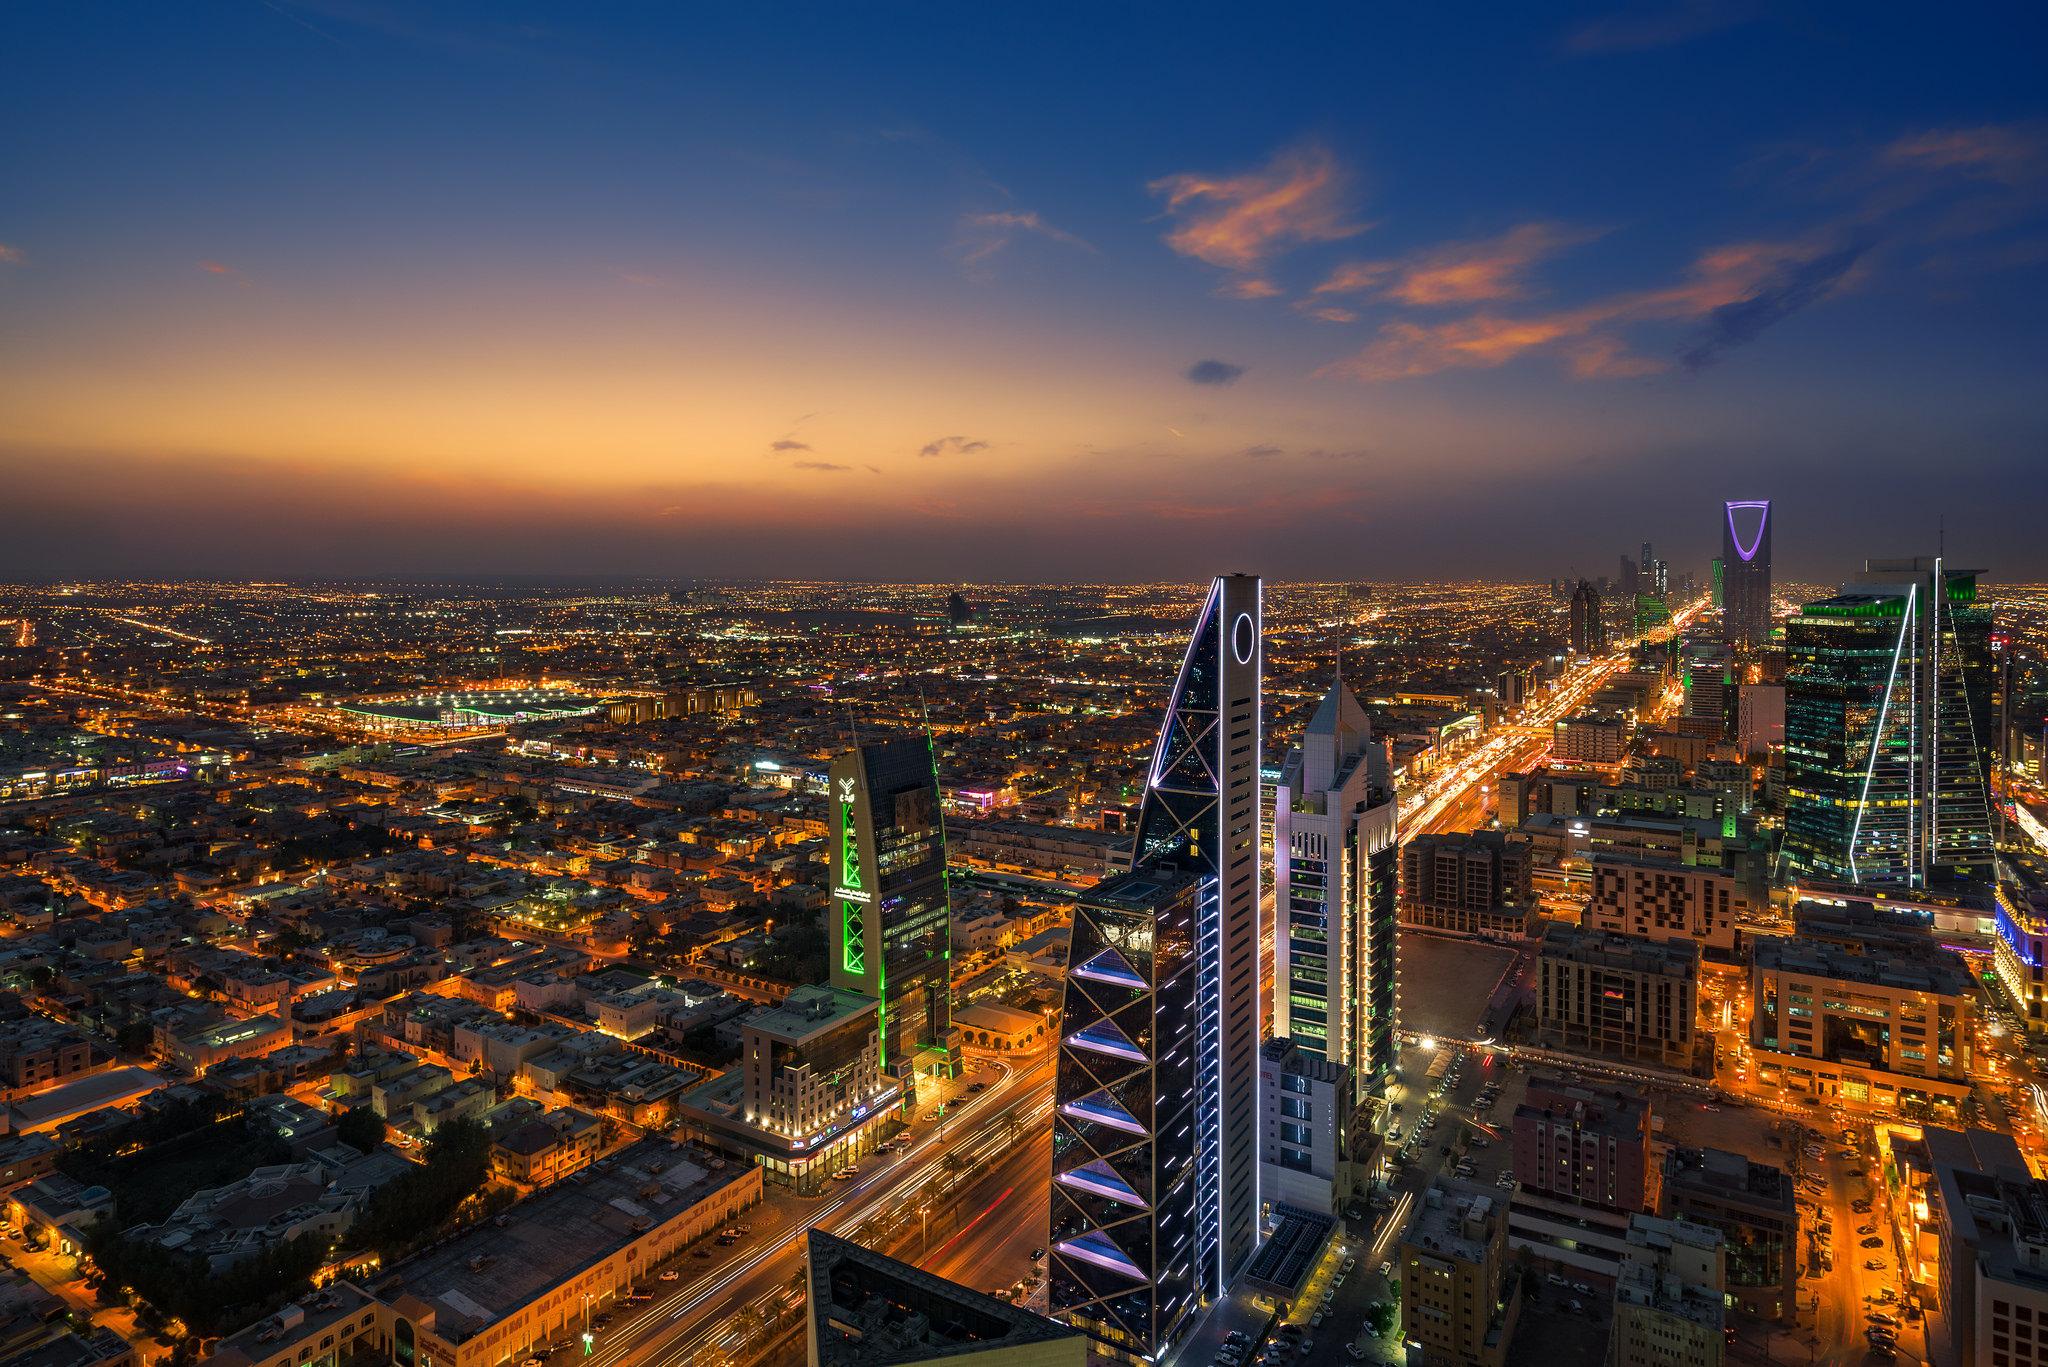 C510: Global Watchdog Takes Saudi Arabia to Task for Lax Anti-terrorism Finance Measures